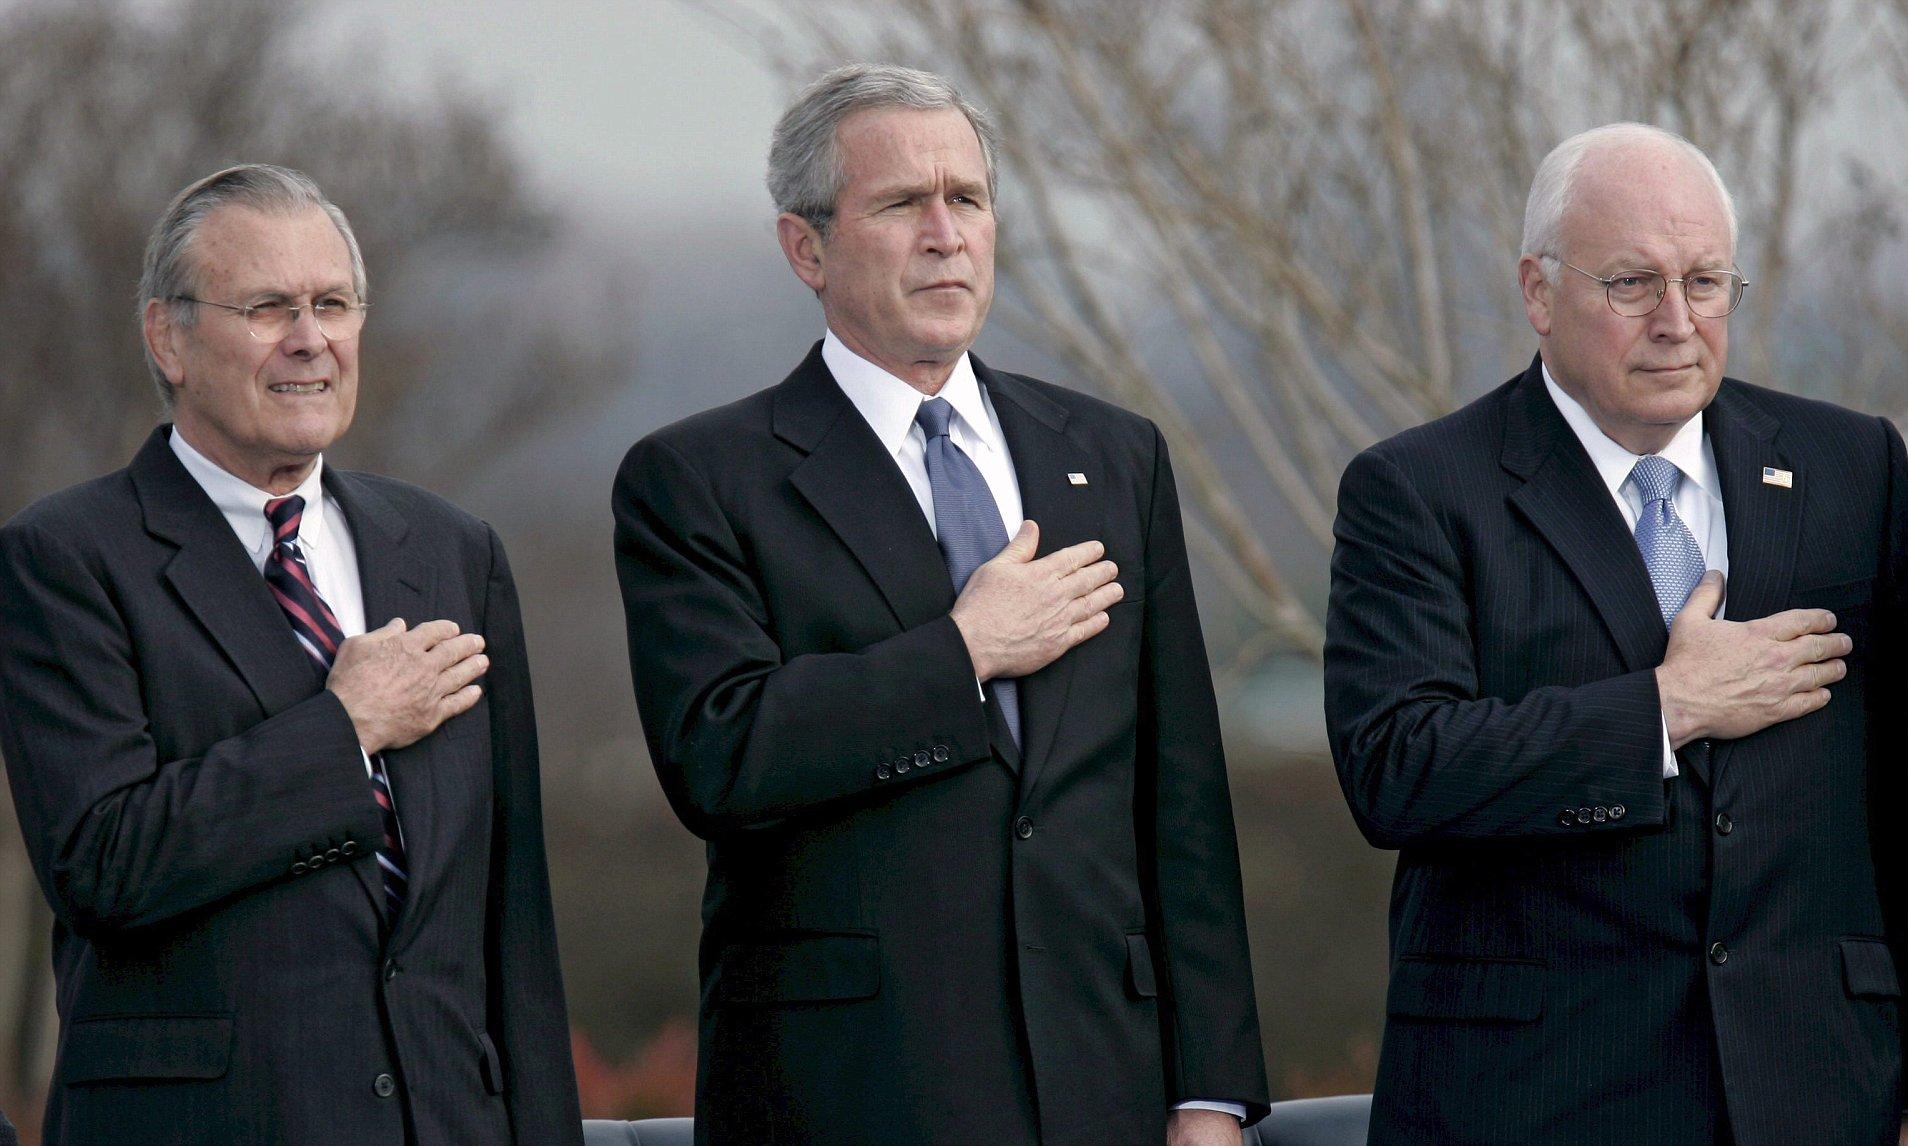 Bush and Co